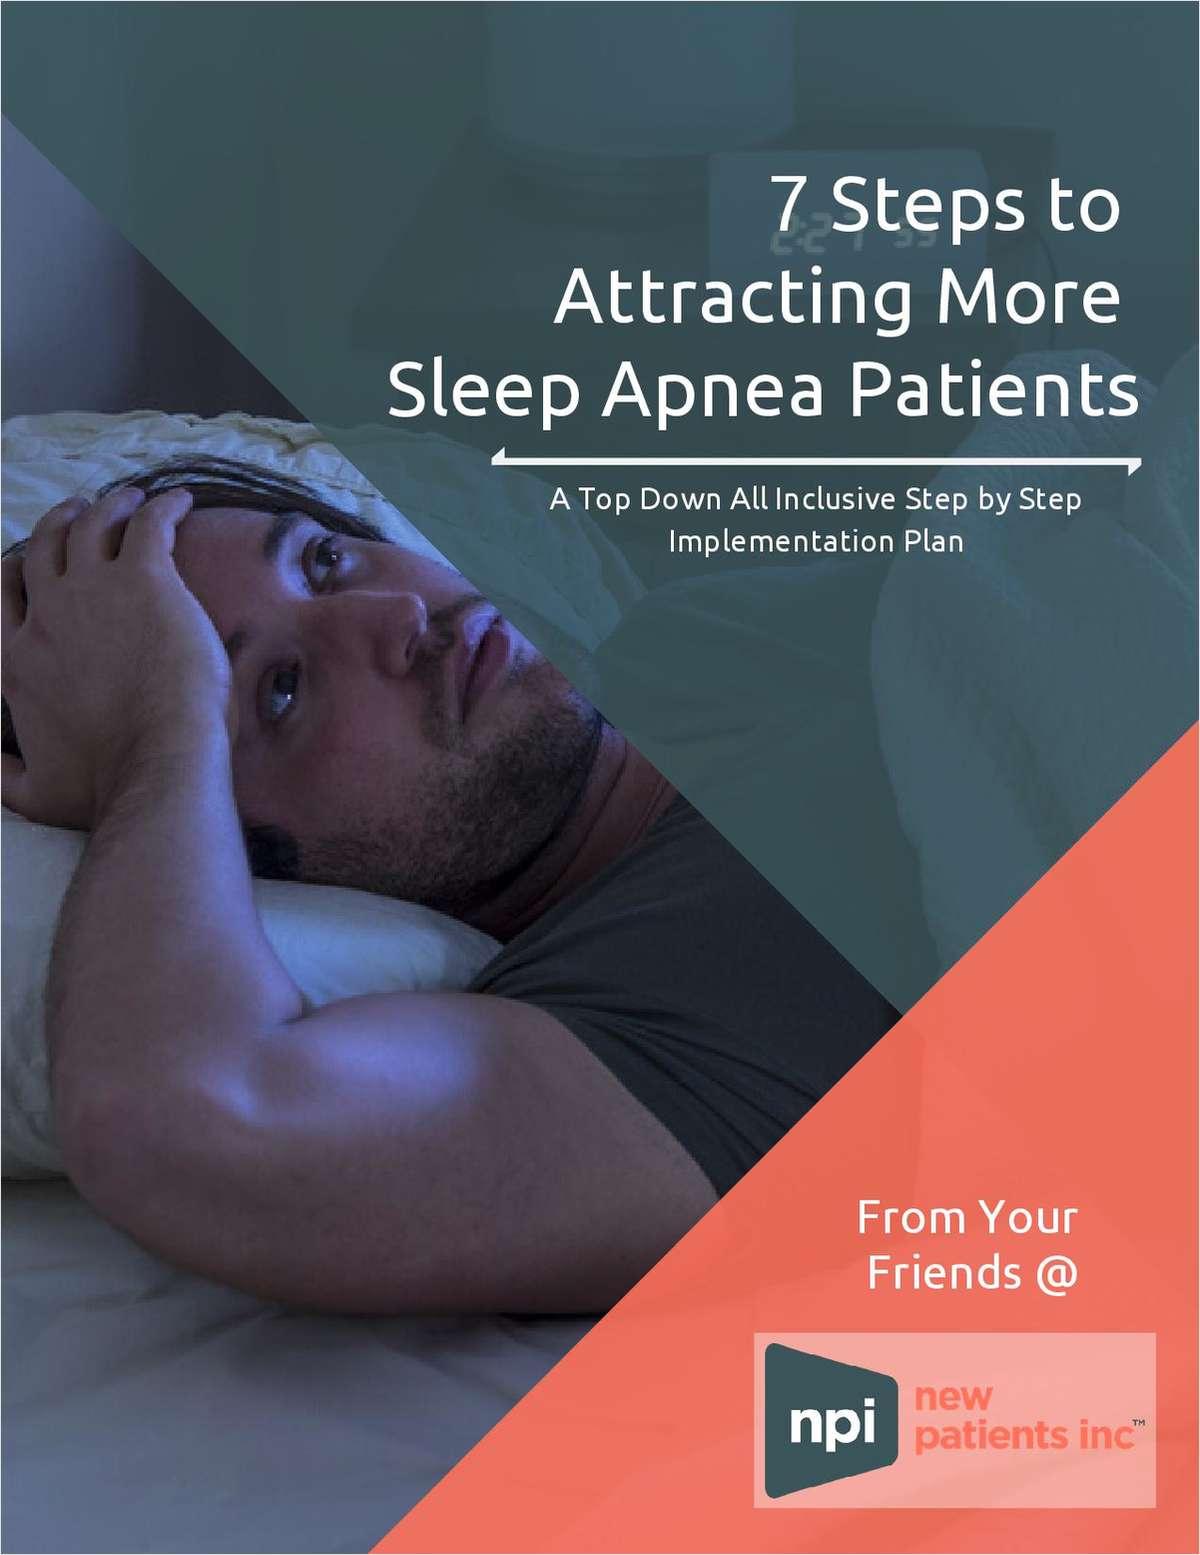 7 Steps to Attracting More Sleep Apnea Patients